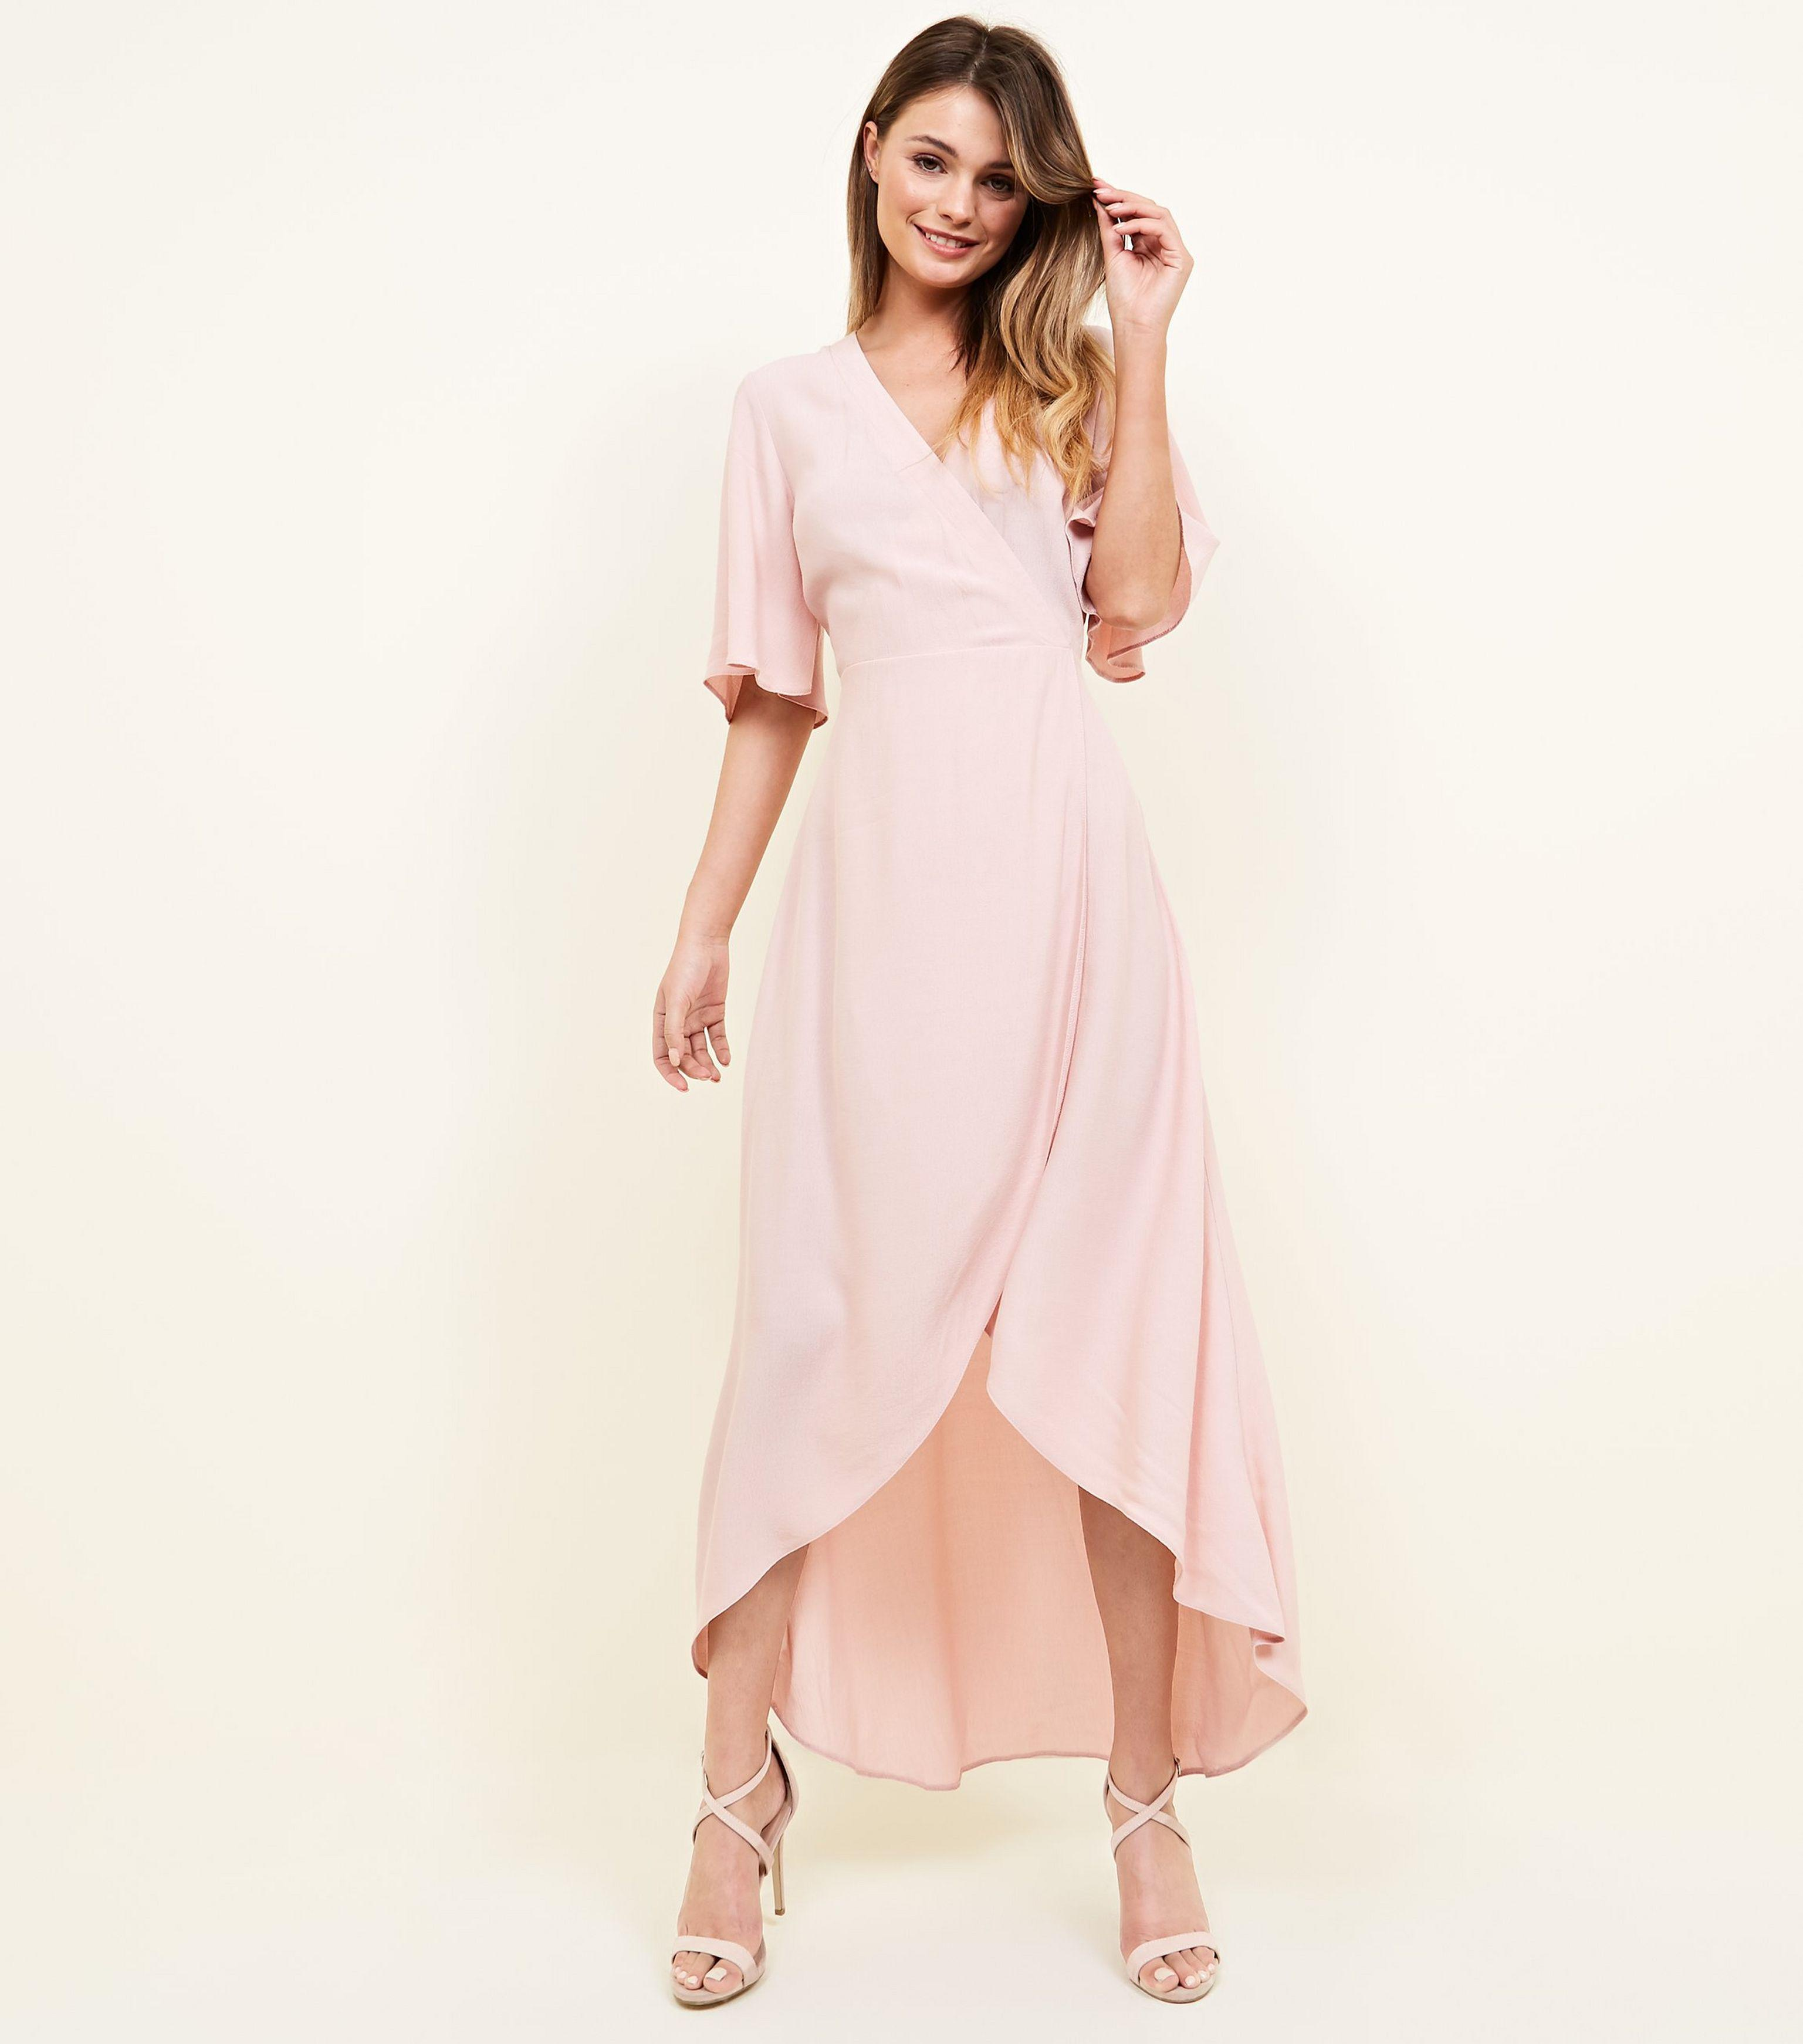 782c4052d2d New Look Pale Pink Wrap Front Dip Hem Maxi Dress in Pink - Lyst